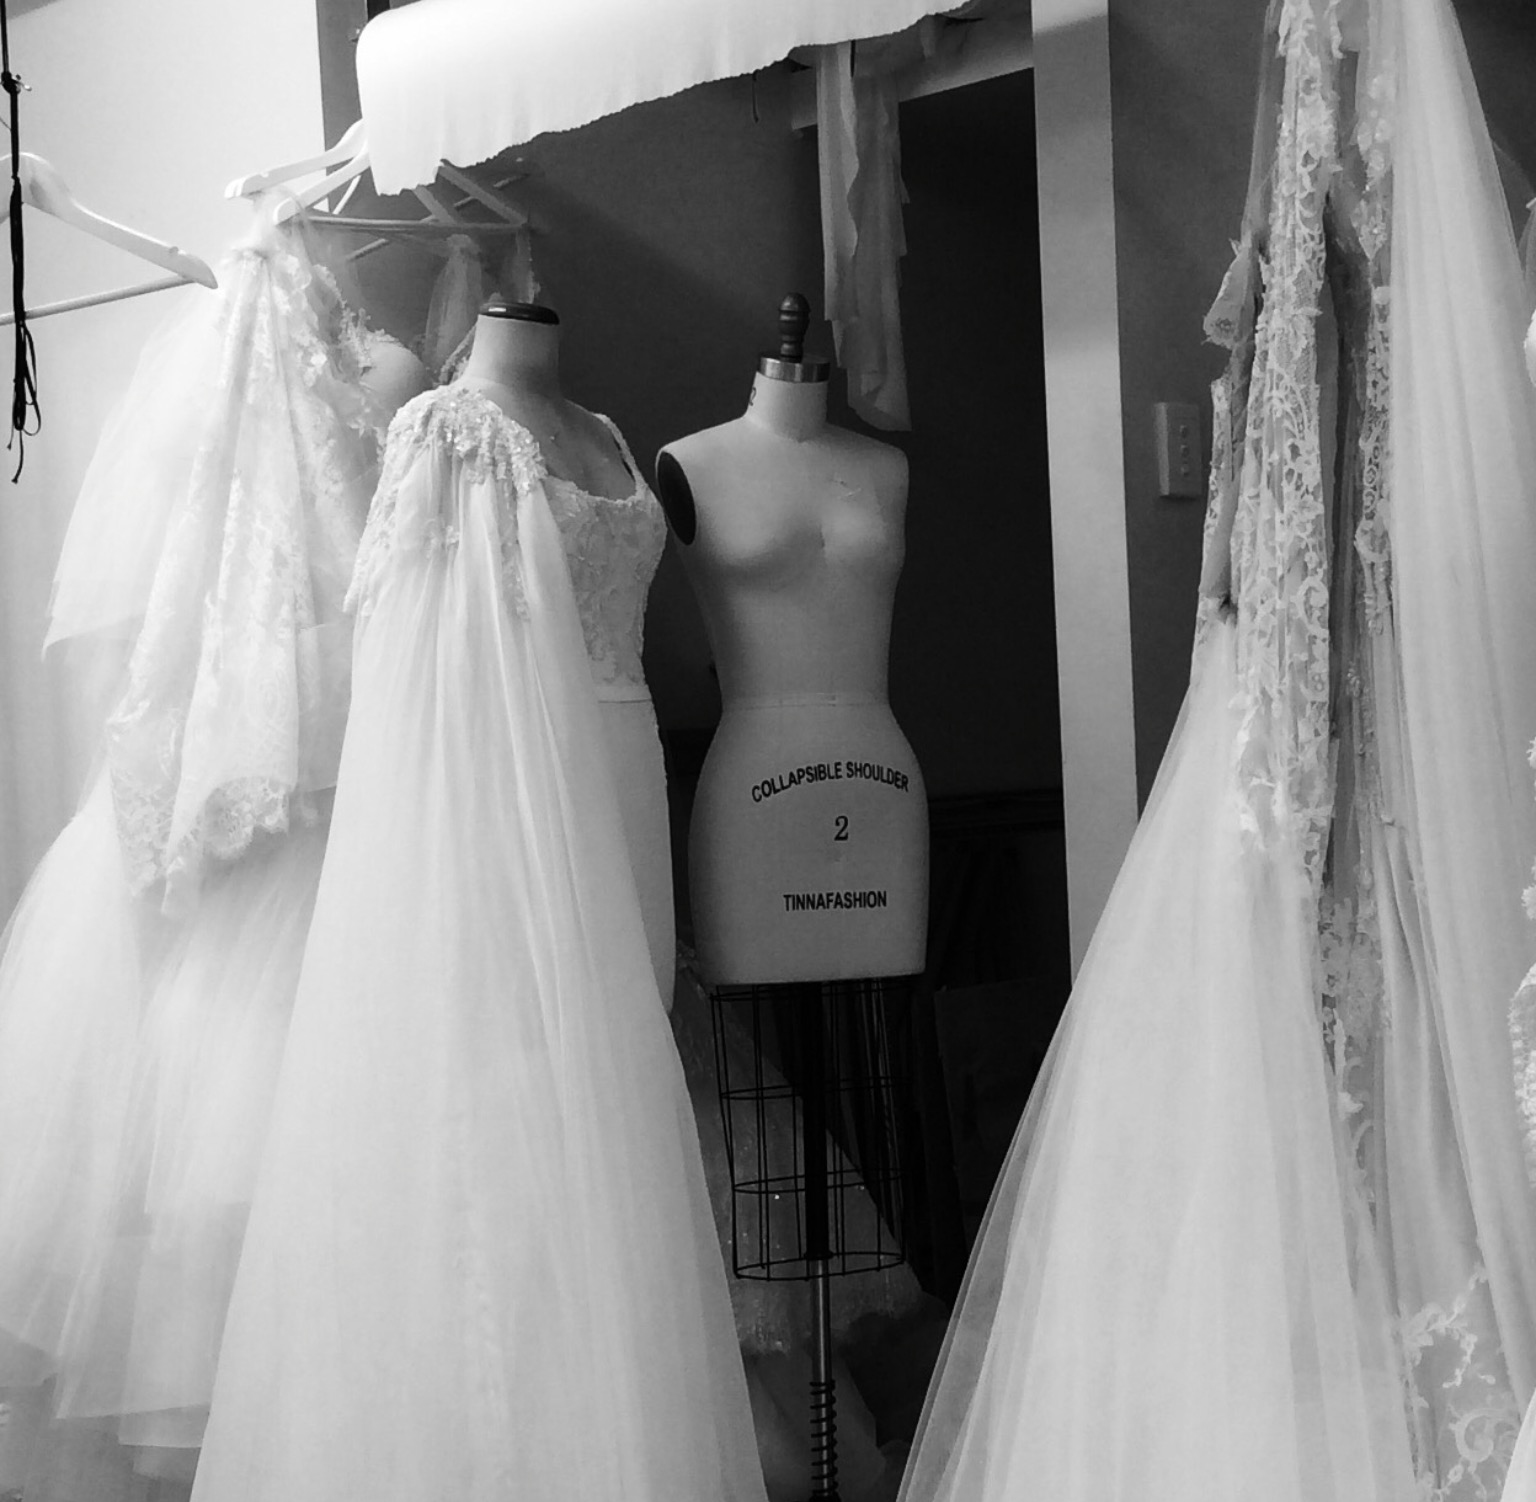 MXM Couture Weddding Dresses In Studio